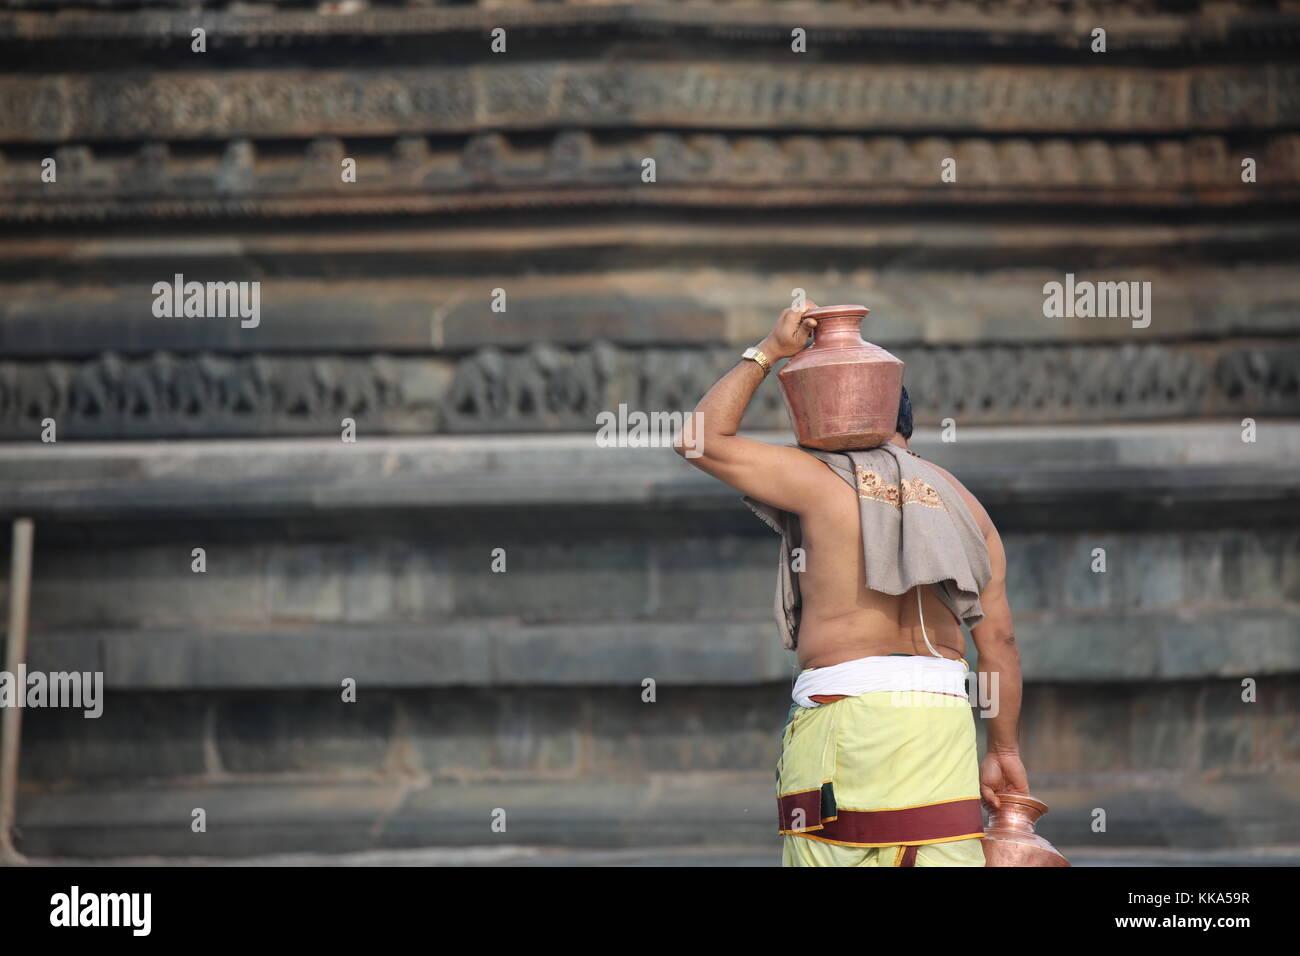 Morning in Chenna Keshava Vishnu Temple - priest with lota kalash pot making offerings - Priester mit Kuferkrug Stock Photo